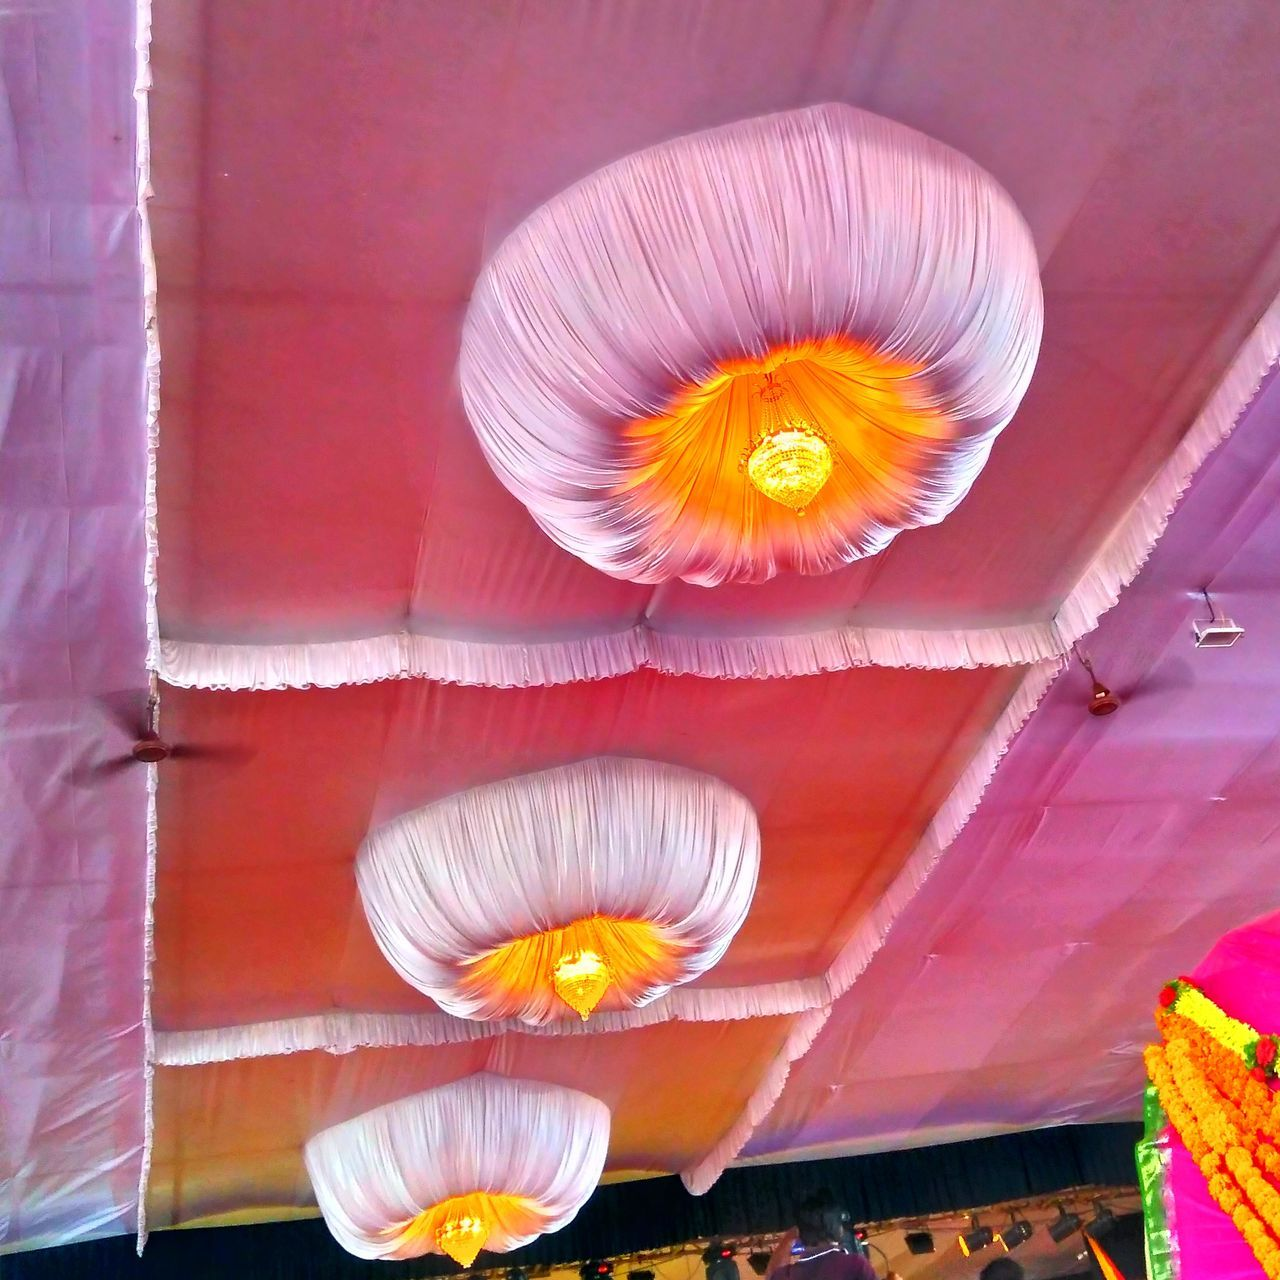 flower, no people, hanging, petal, illuminated, flower head, lantern, outdoors, close-up, day, jack o lantern